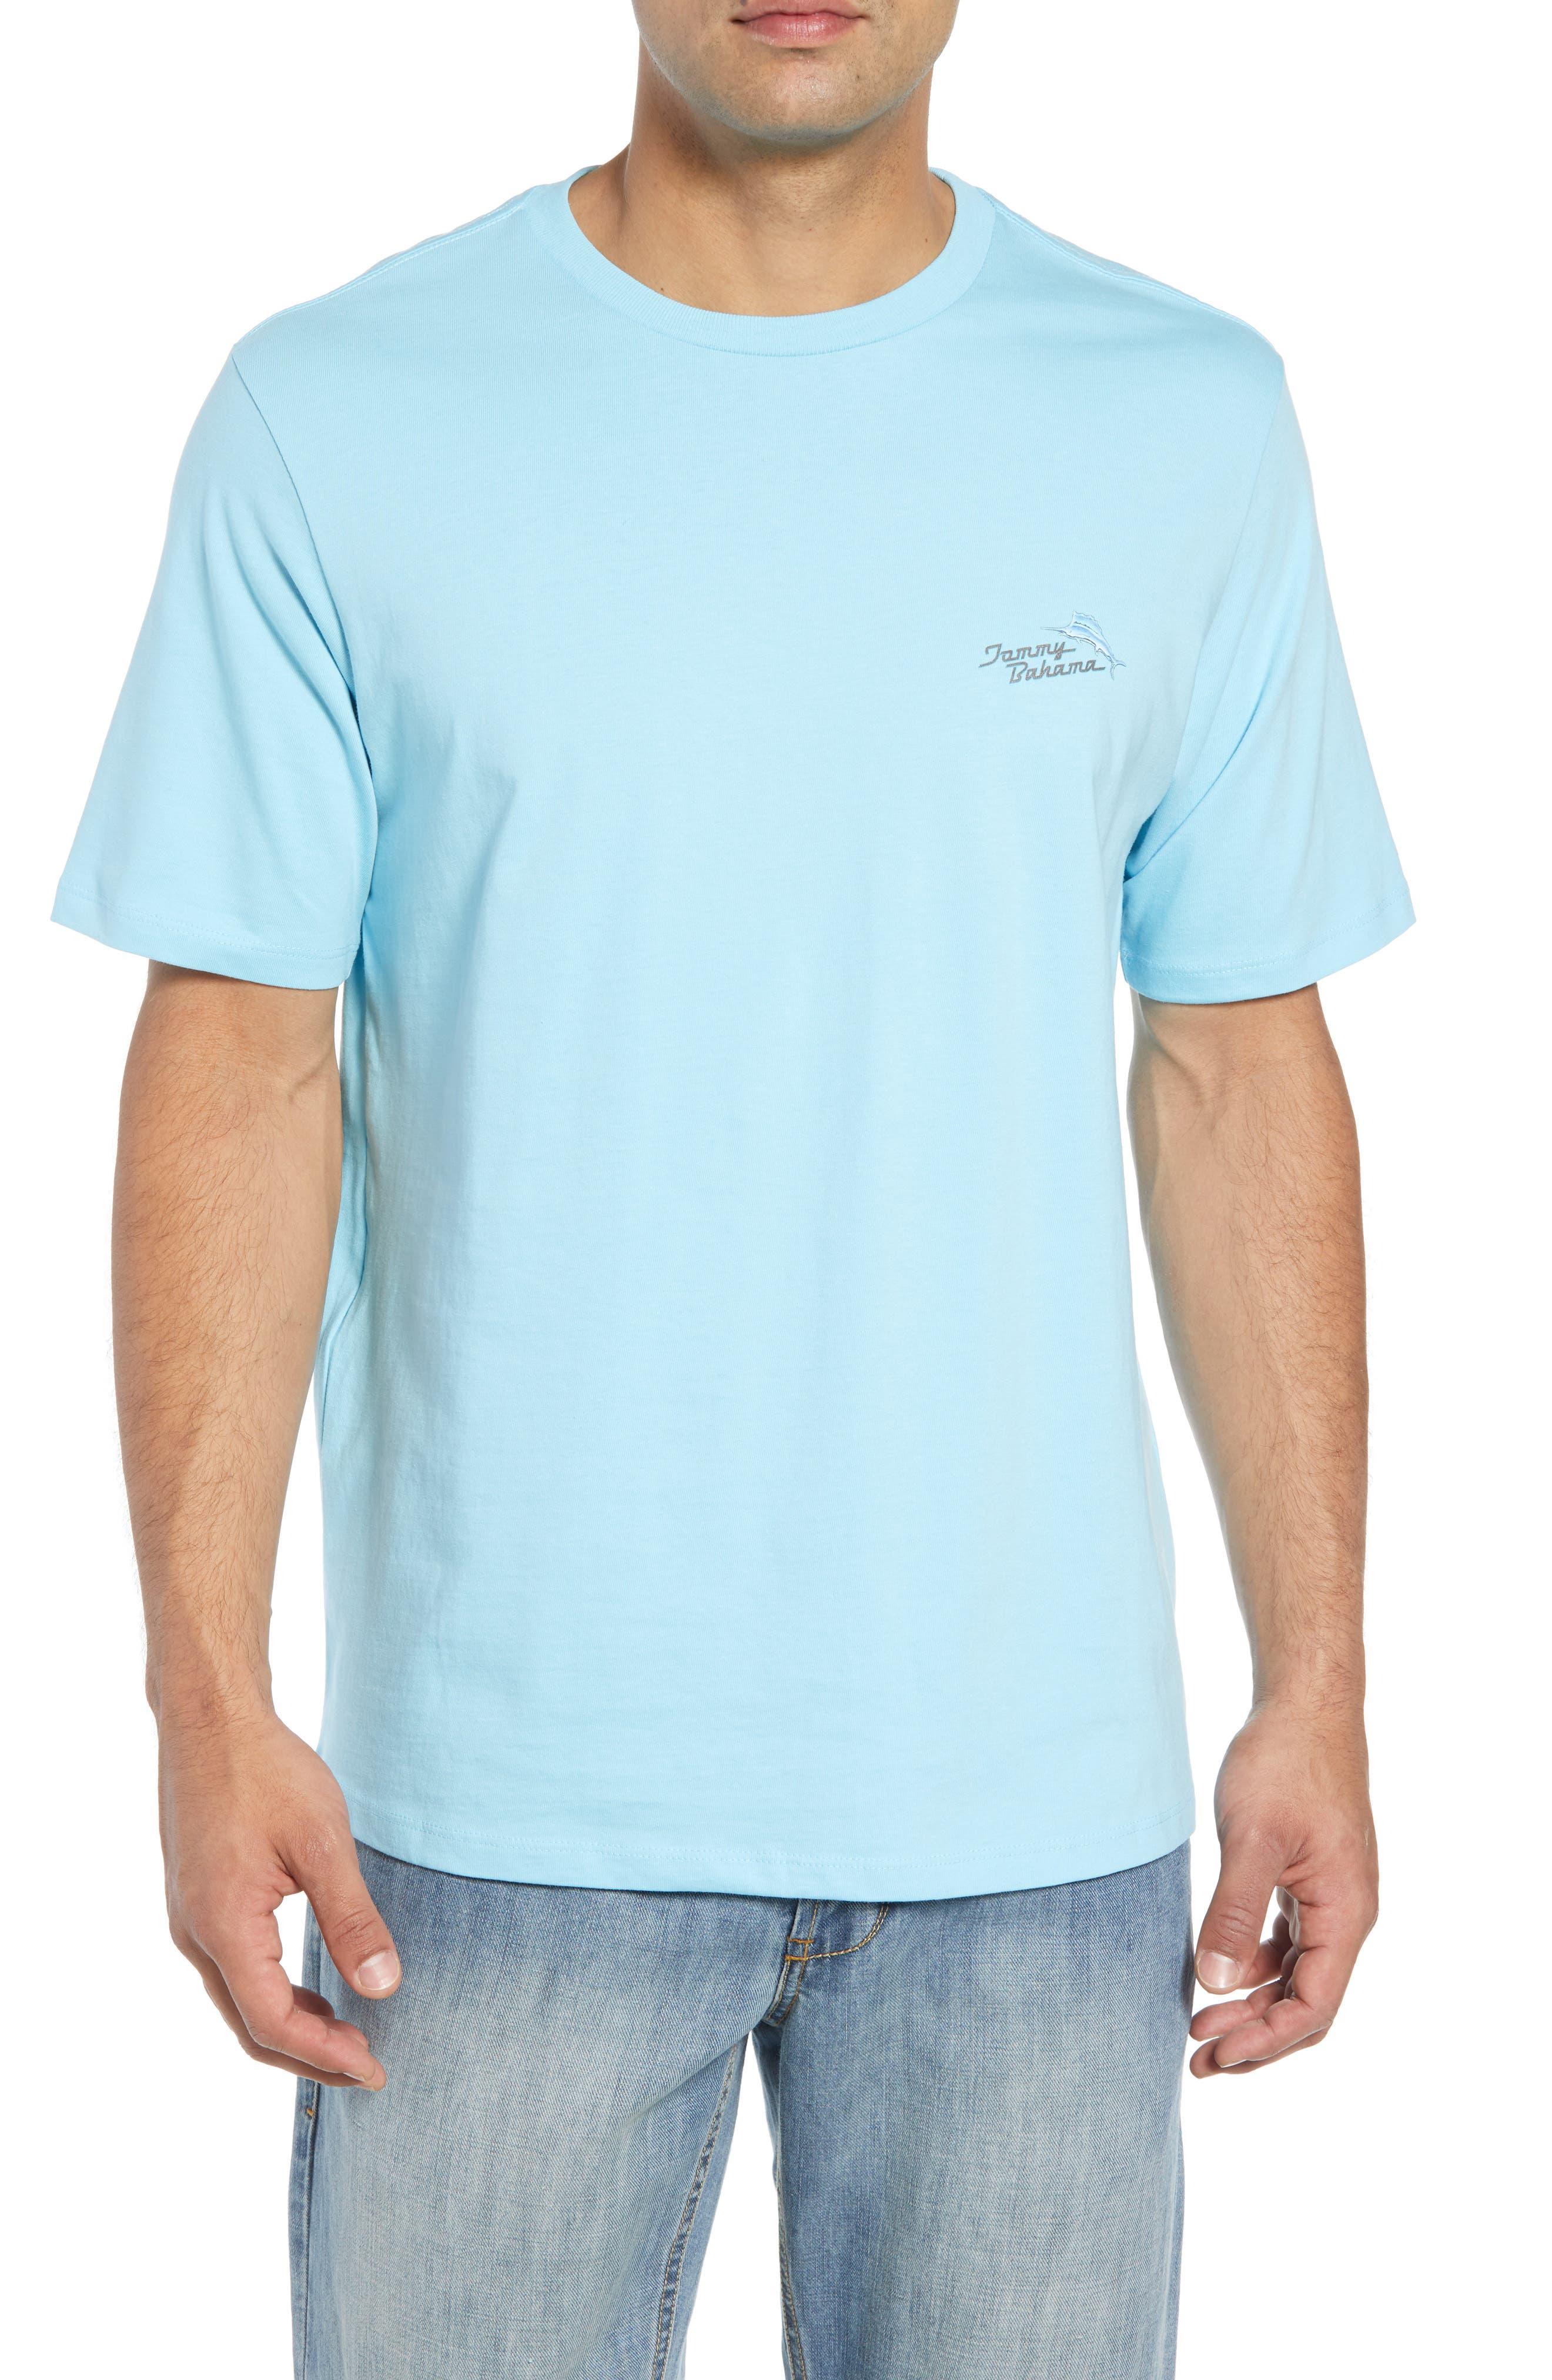 Beach Grille T-Shirt,                             Main thumbnail 1, color,                             Bowtie Blue